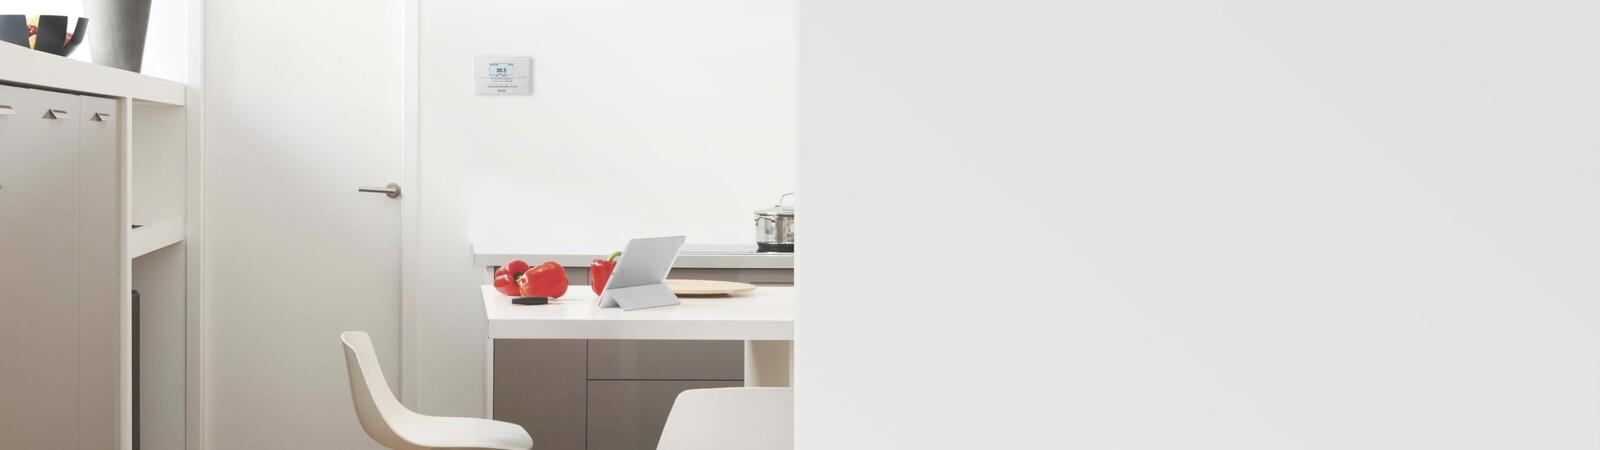 https://www.awb.nl/productfotos-vrij/mipro/2mipro-kitchen-nederland-online-966564-format-32-9@1600@desktop.jpg